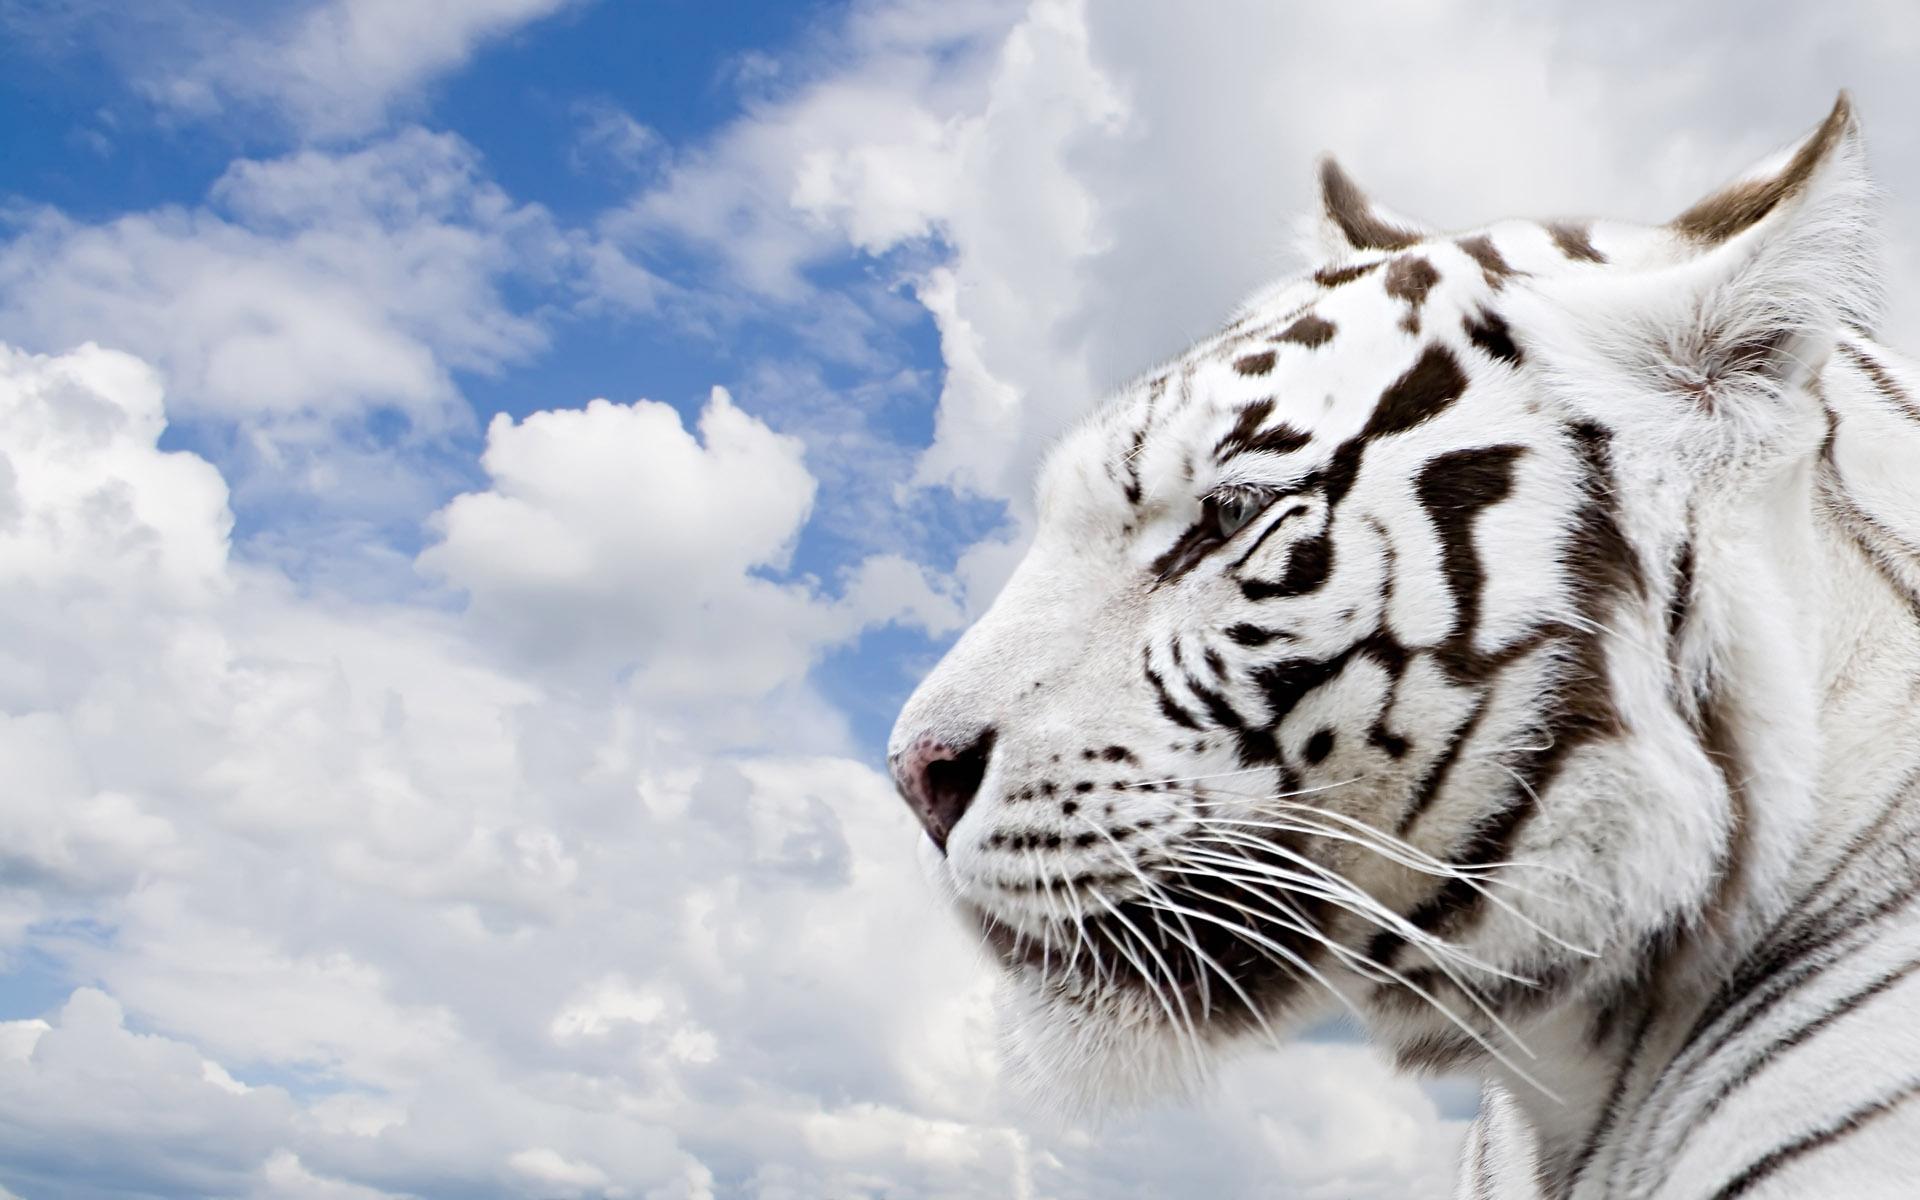 White tiger Desktop Wallpapers FREE on Latorocom 1920x1200